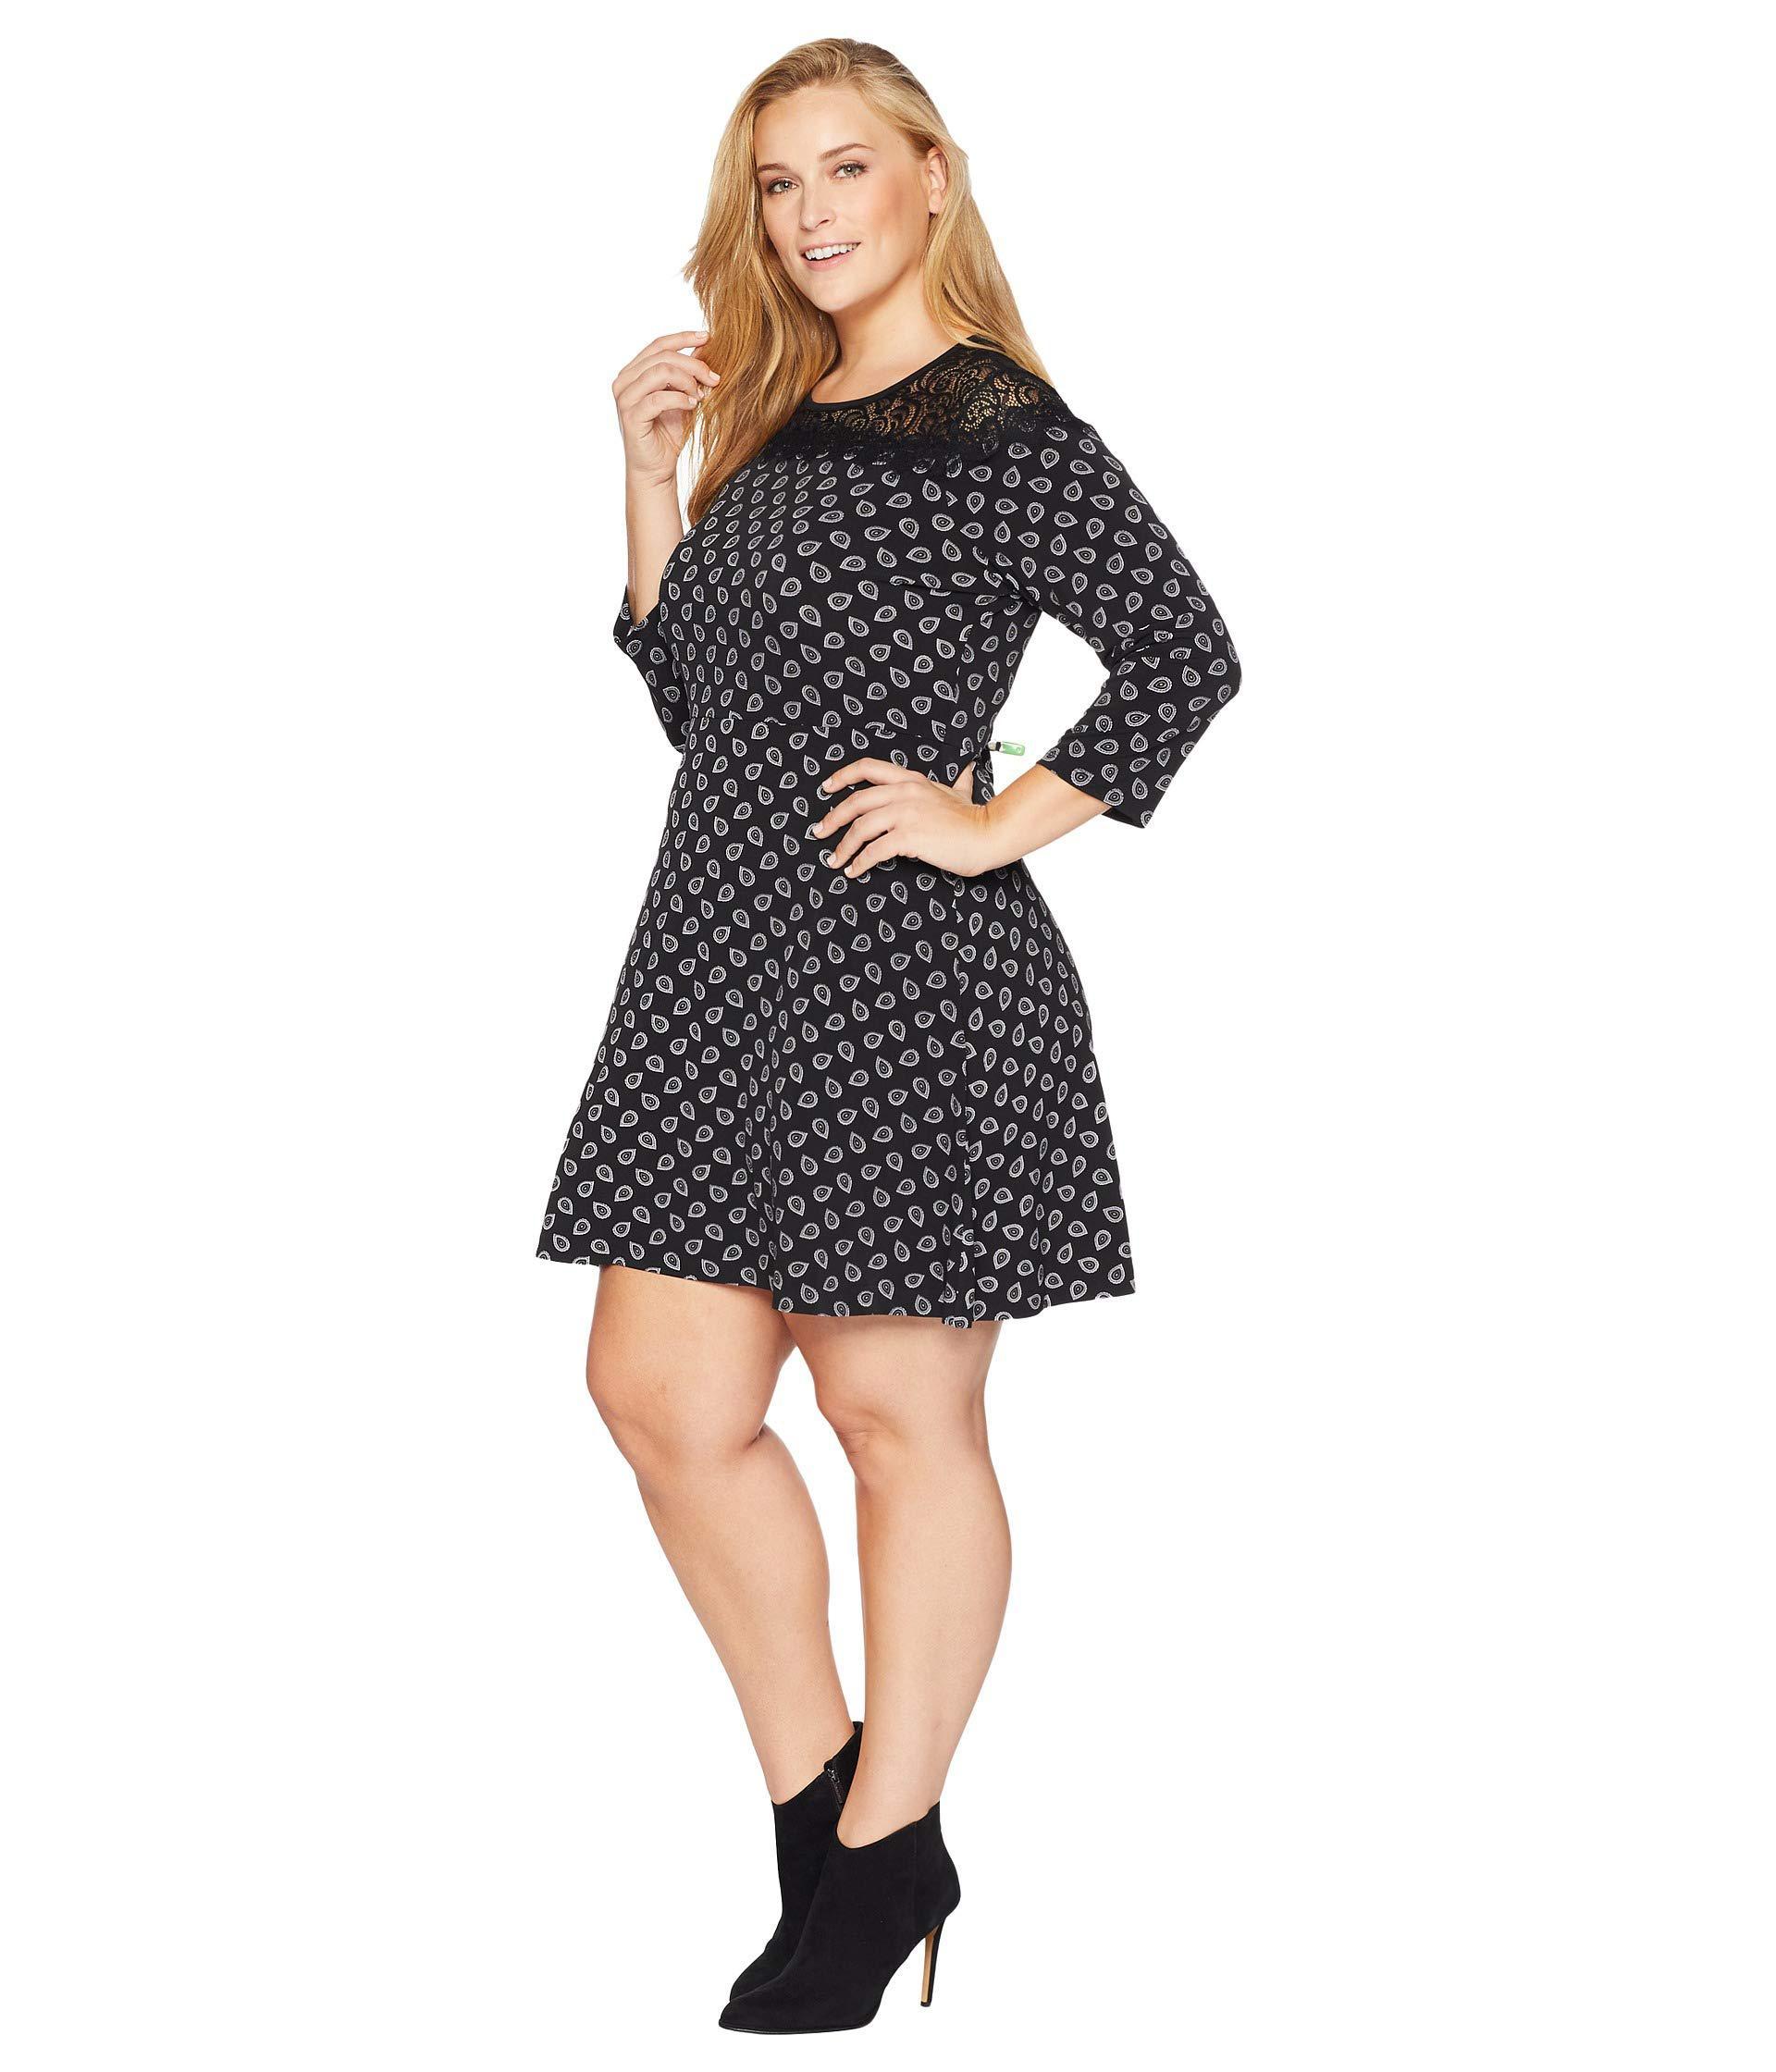 0b12e673c7ac0 Lyst - MICHAEL Michael Kors Plus Size Foulard Print Lace Dress in Black -  Save 36%